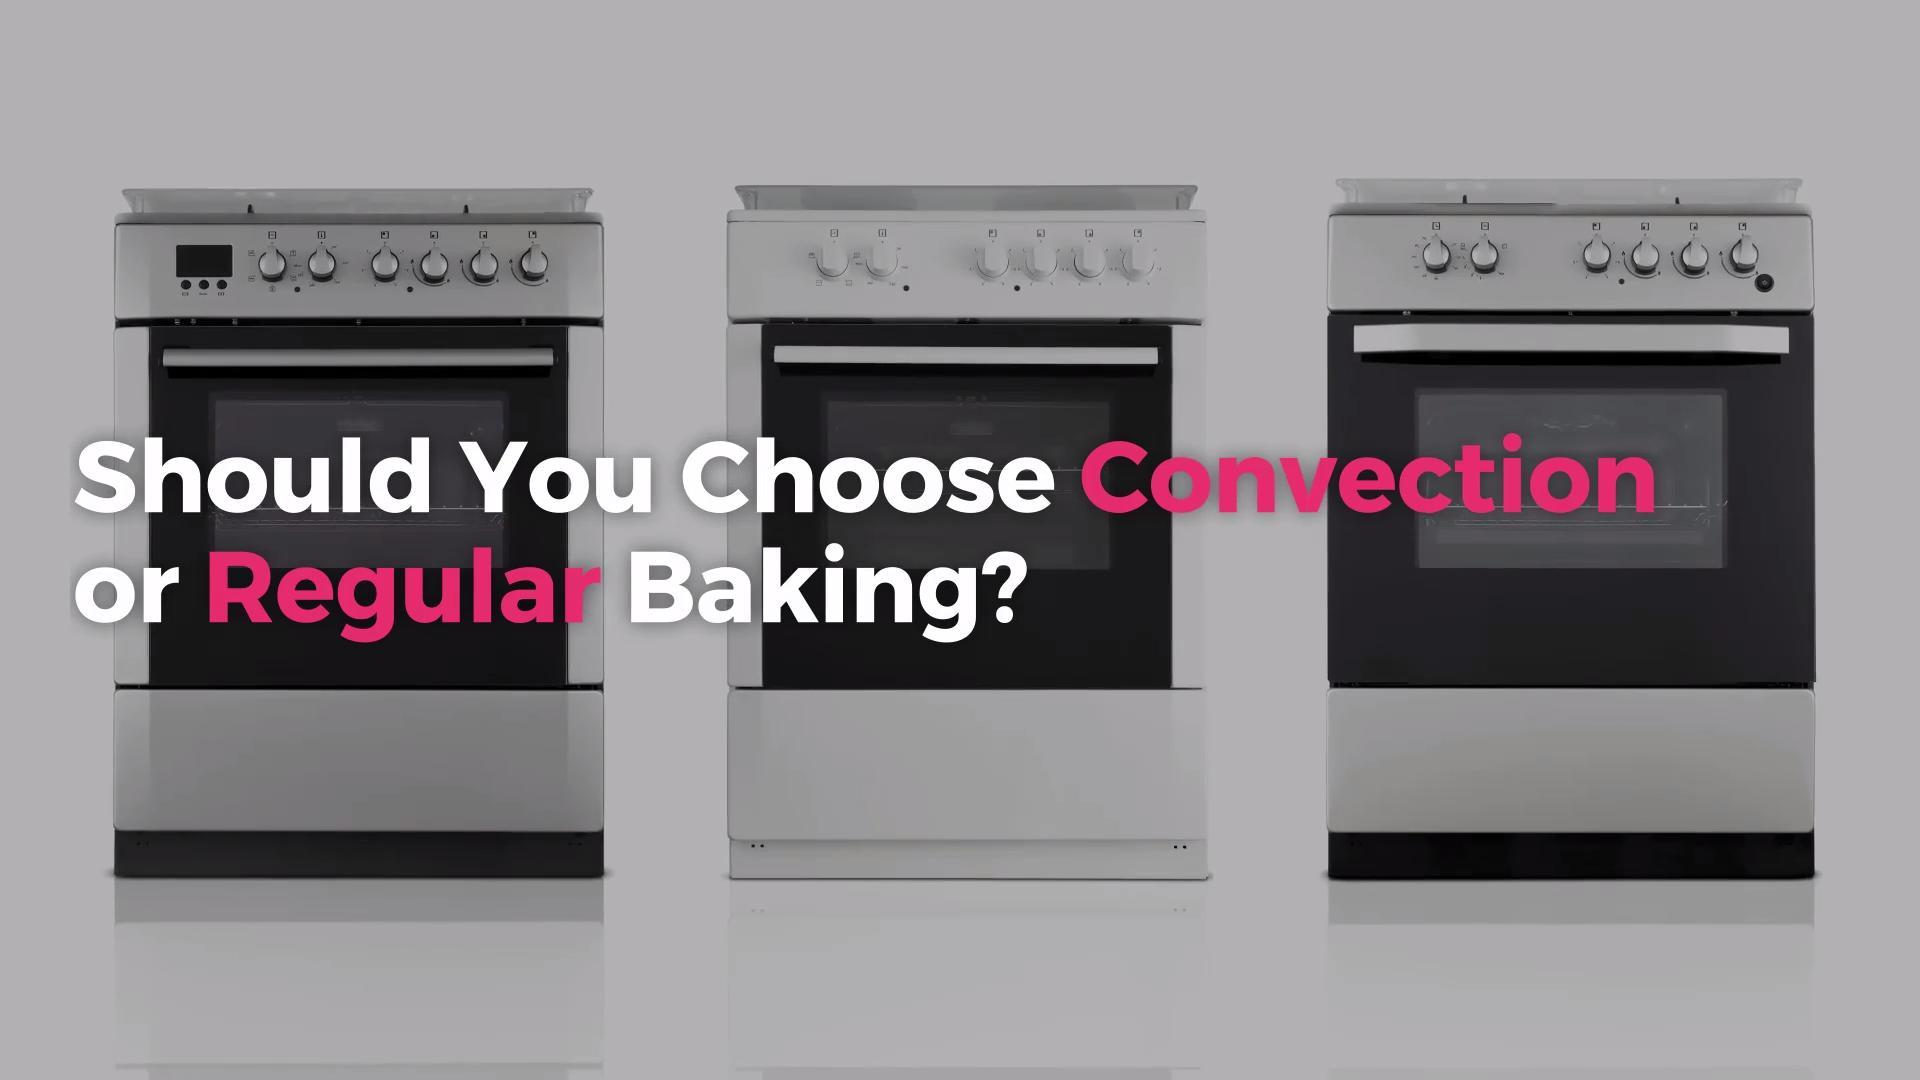 Convection Baking or Regular Baking?